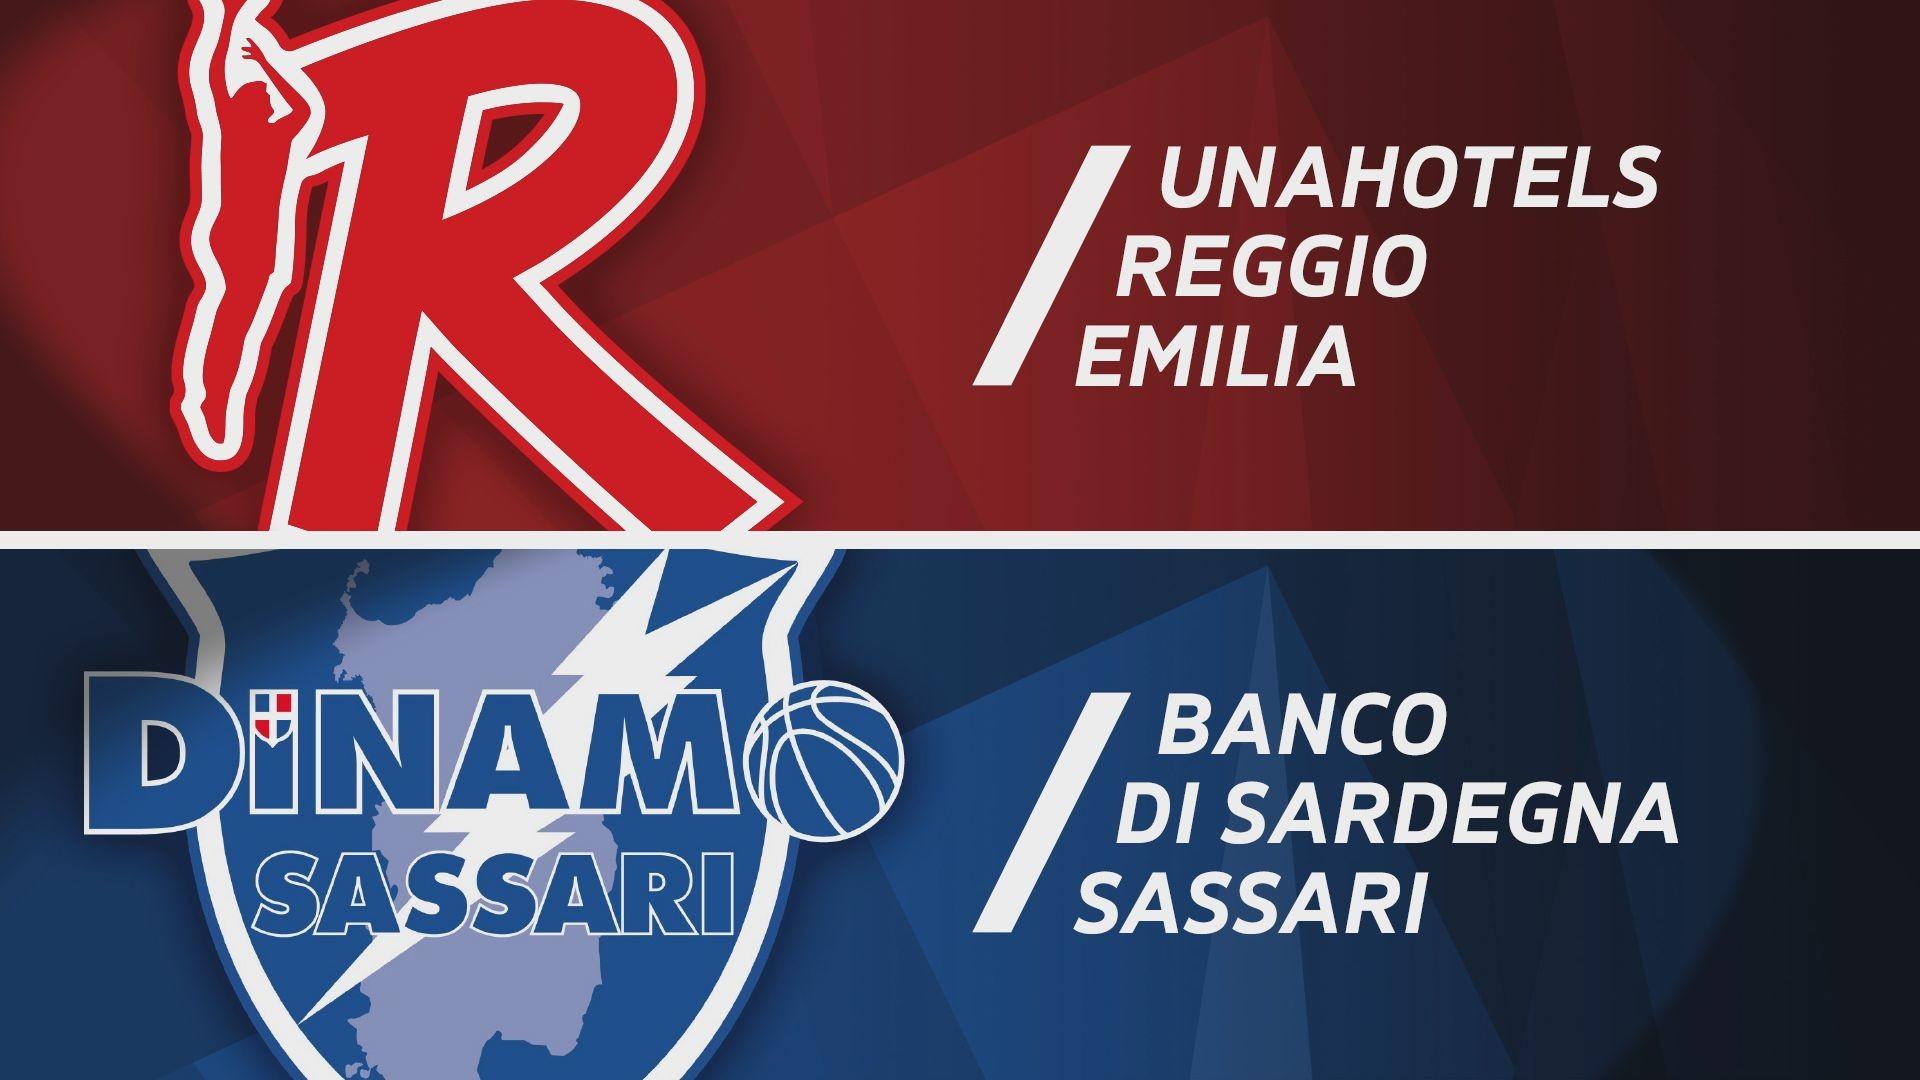 UNAHOTELS Reggio Emilia - Banco di Sardegna Sassari 78-85